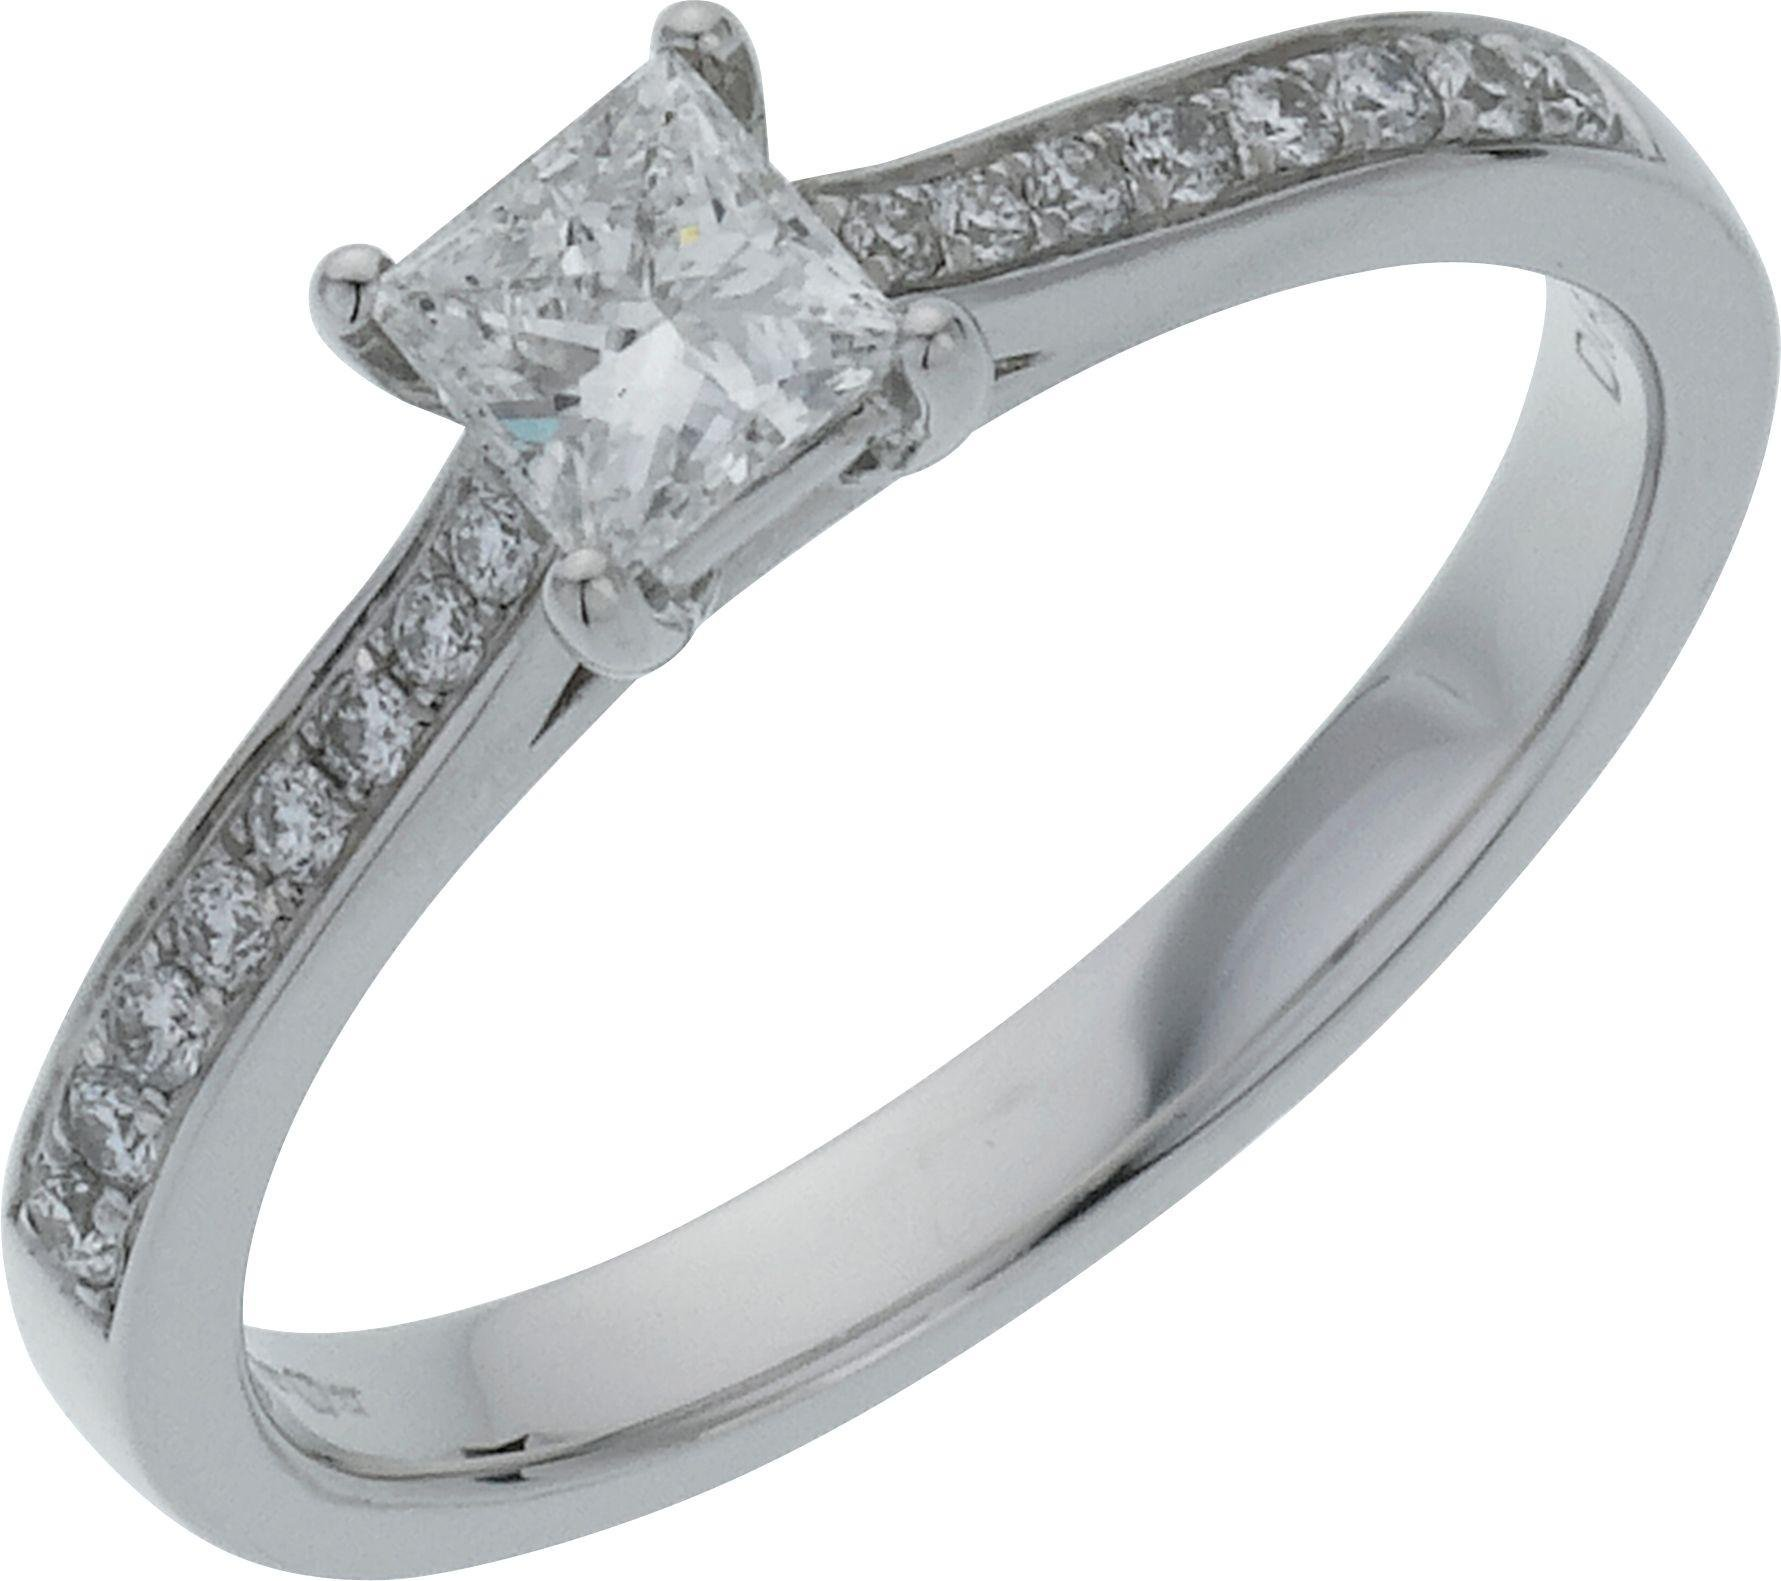 18 Carat White Gold 05 Carat Diamond - Princess Cut Shoulder Ring- L